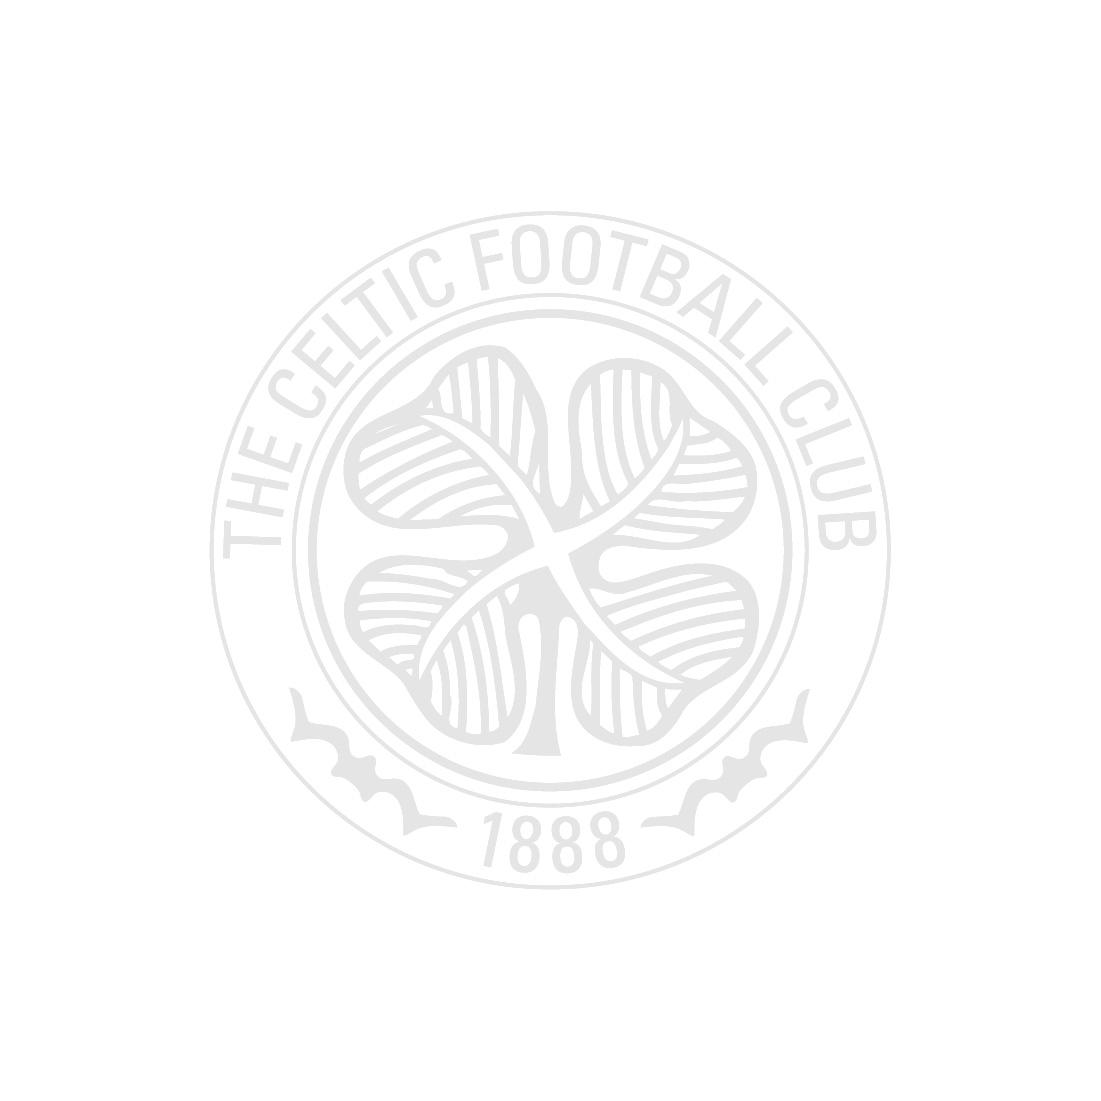 Celtic Park Executive Panoramic Print